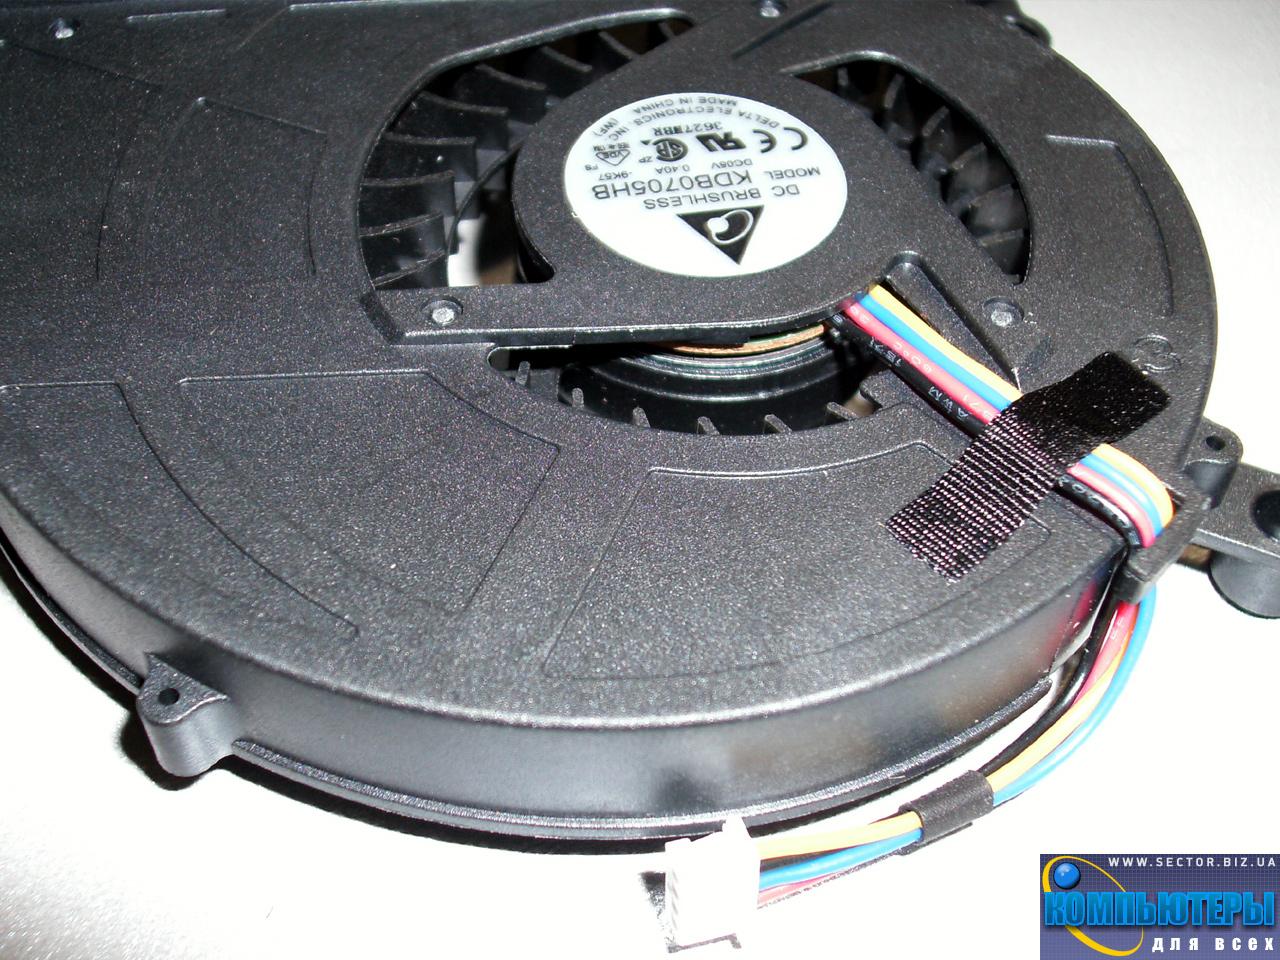 Кулер к ноутбуку Asus X5D X5DI X5DC X5DAF X5 K60 K61IC K70 K70AB K70C p/n: KDB0705HB-9K57. Фото № 5.